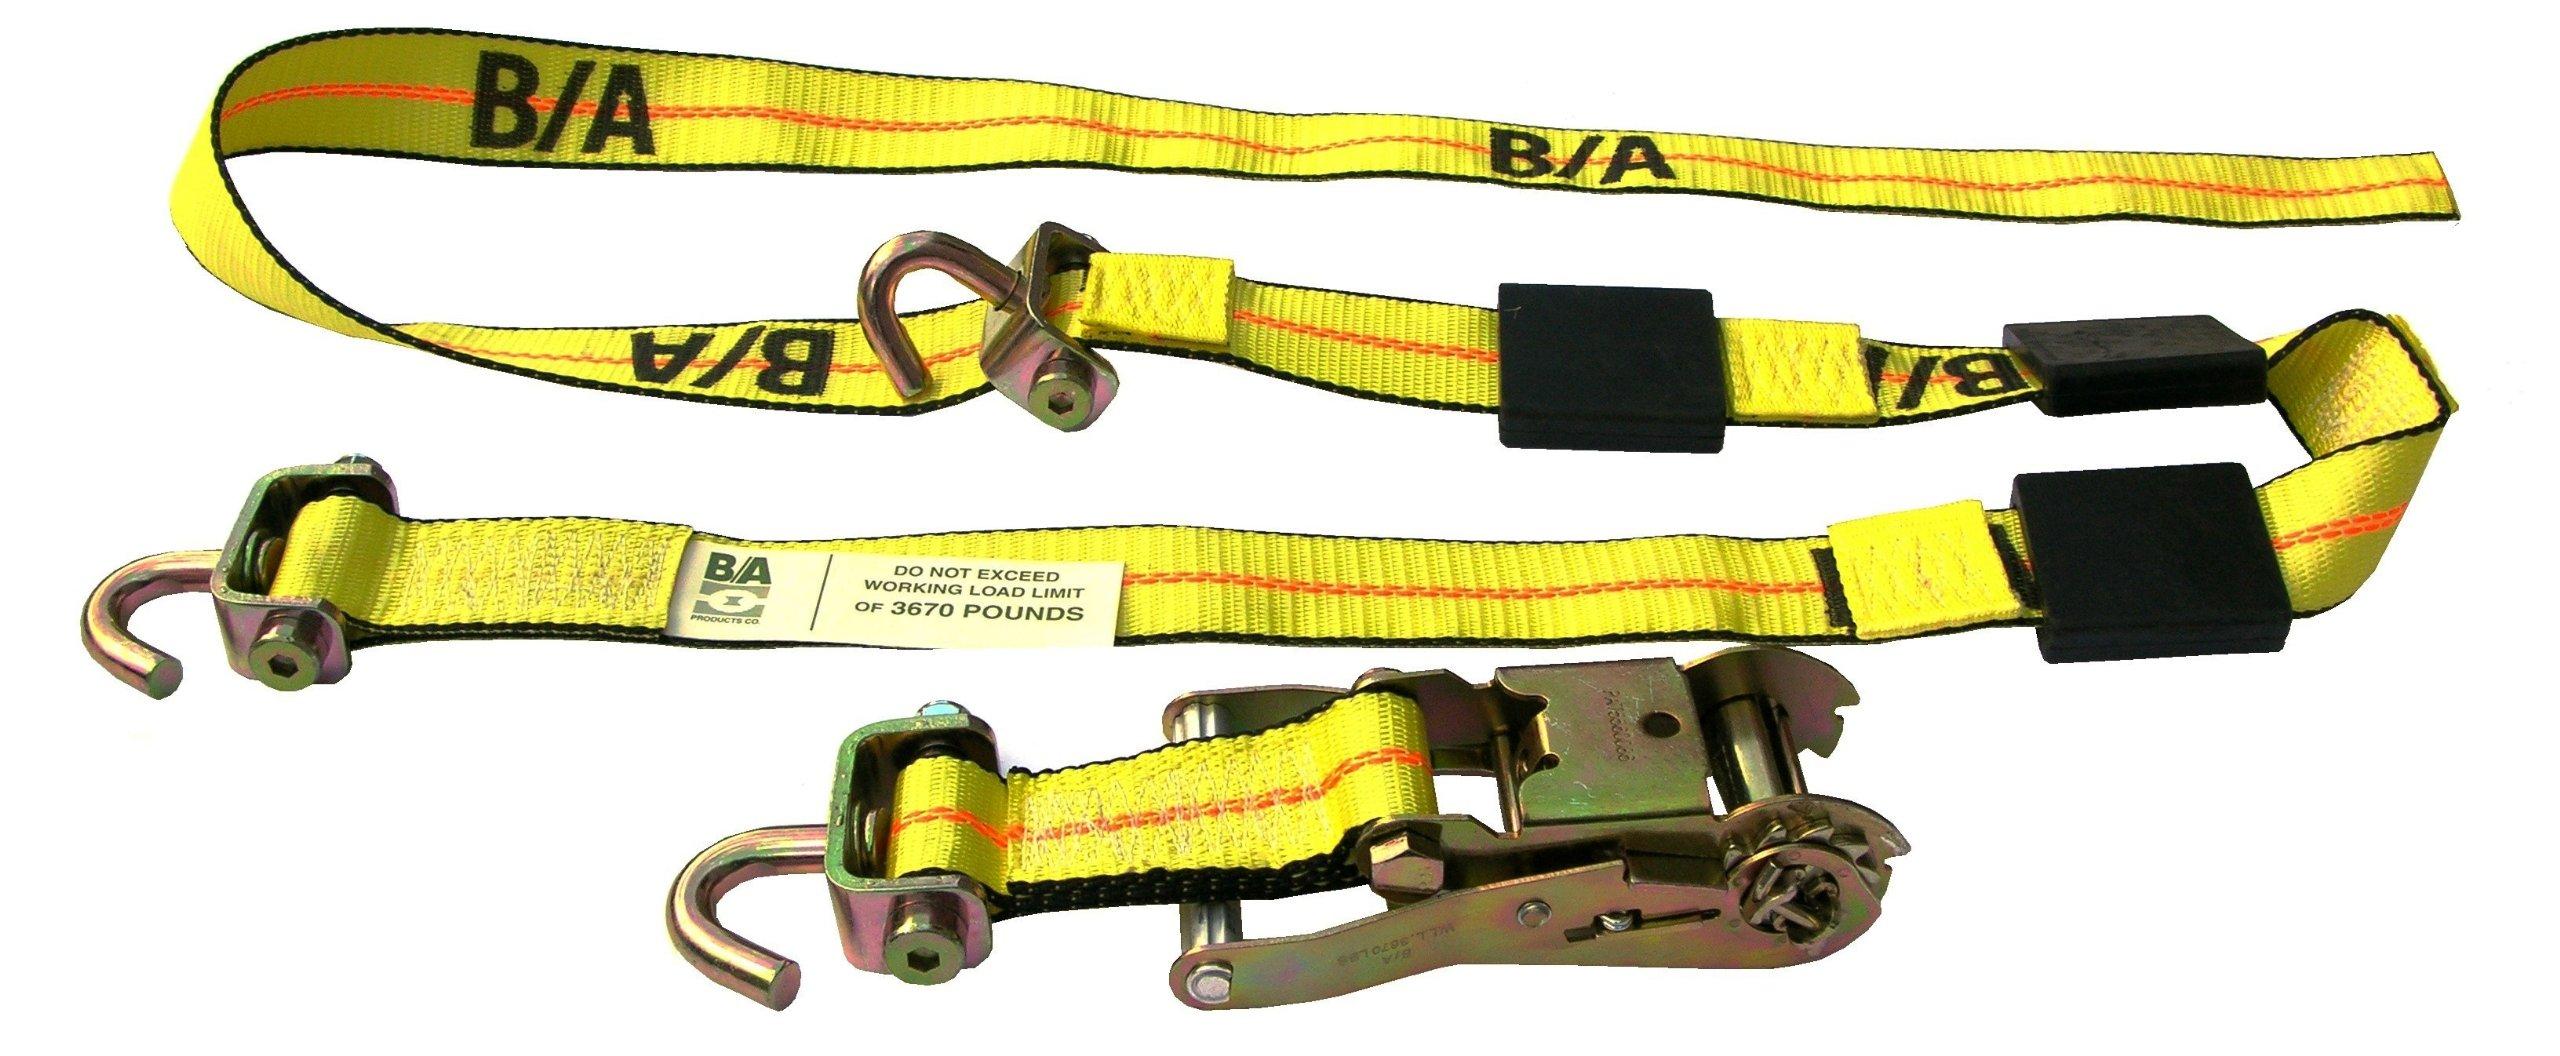 BA Products BA-SJR100-x4, Set of 4 Car Hauler, Transport Trailer Tie Down Straps & Ratchets